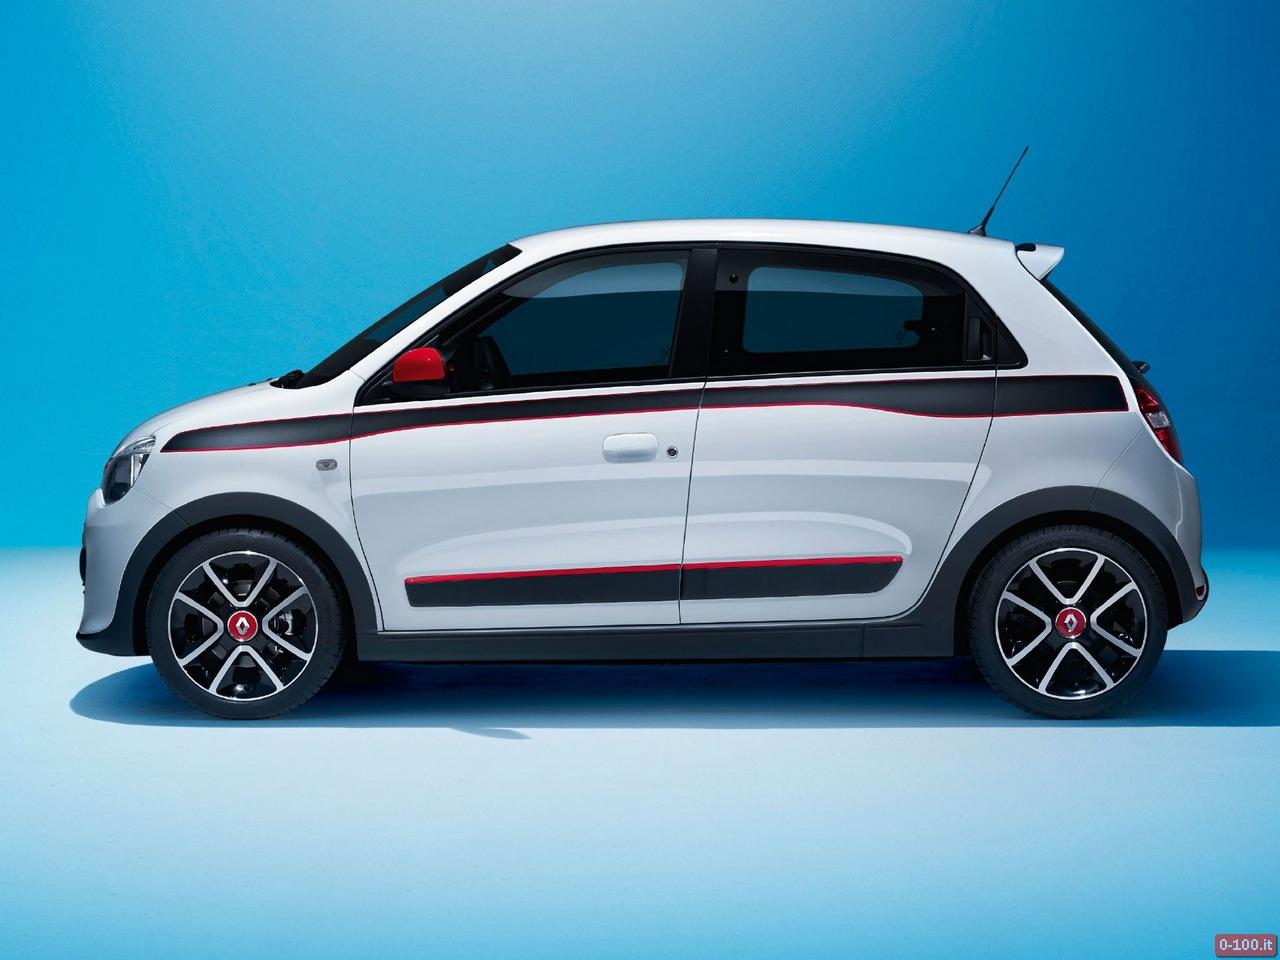 geneve-2014-renault-twingo-motore-posteriore-prezzo-0-100_7